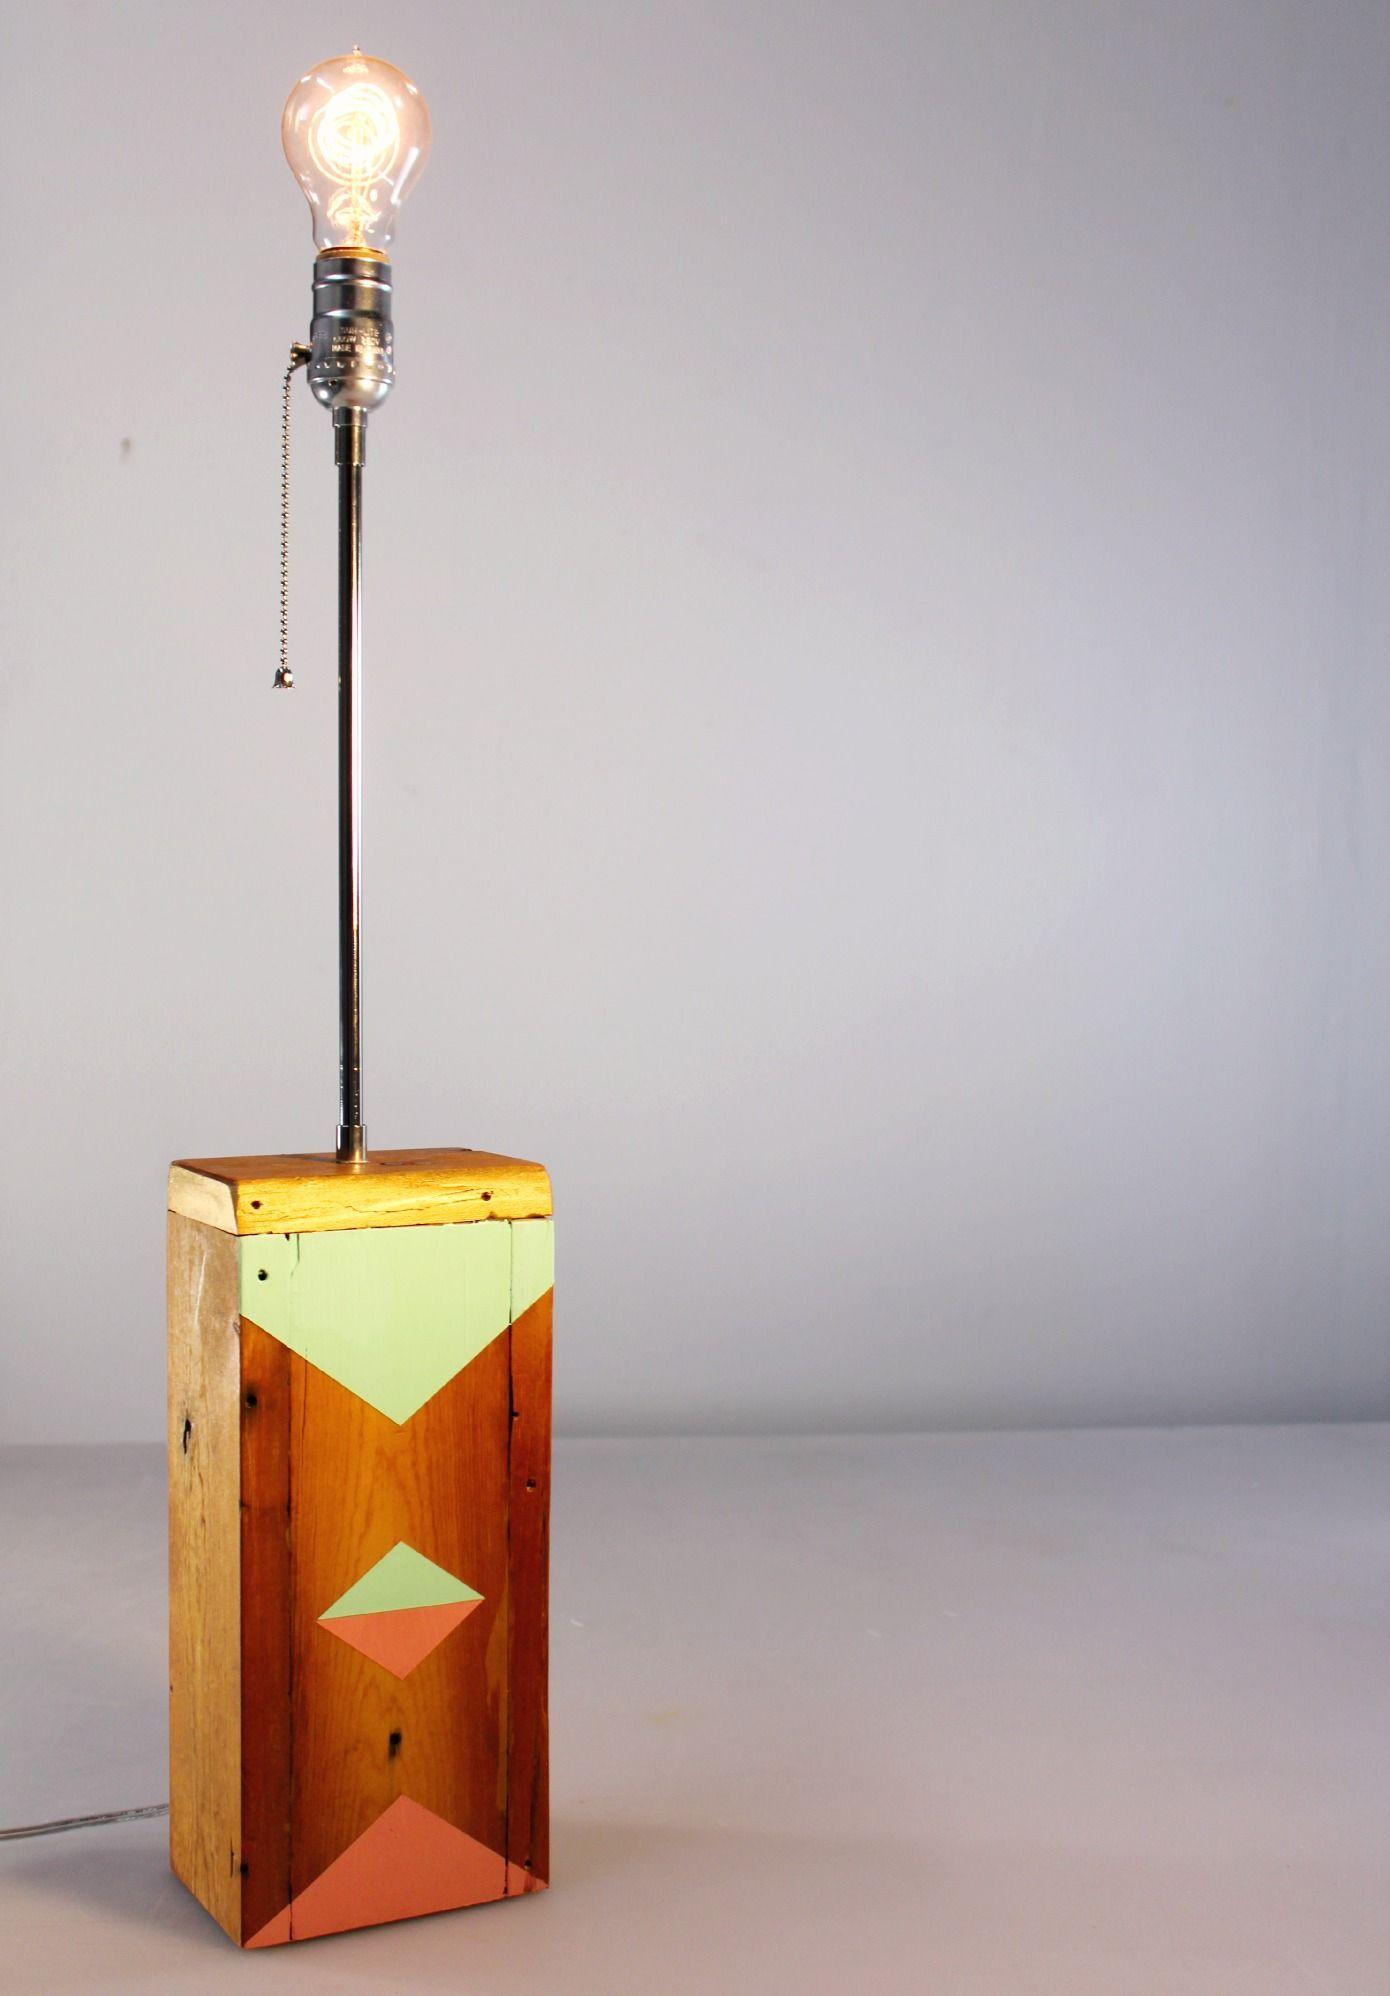 geometric painted wooden lamp base diy table lamp ideas rh pinterest de